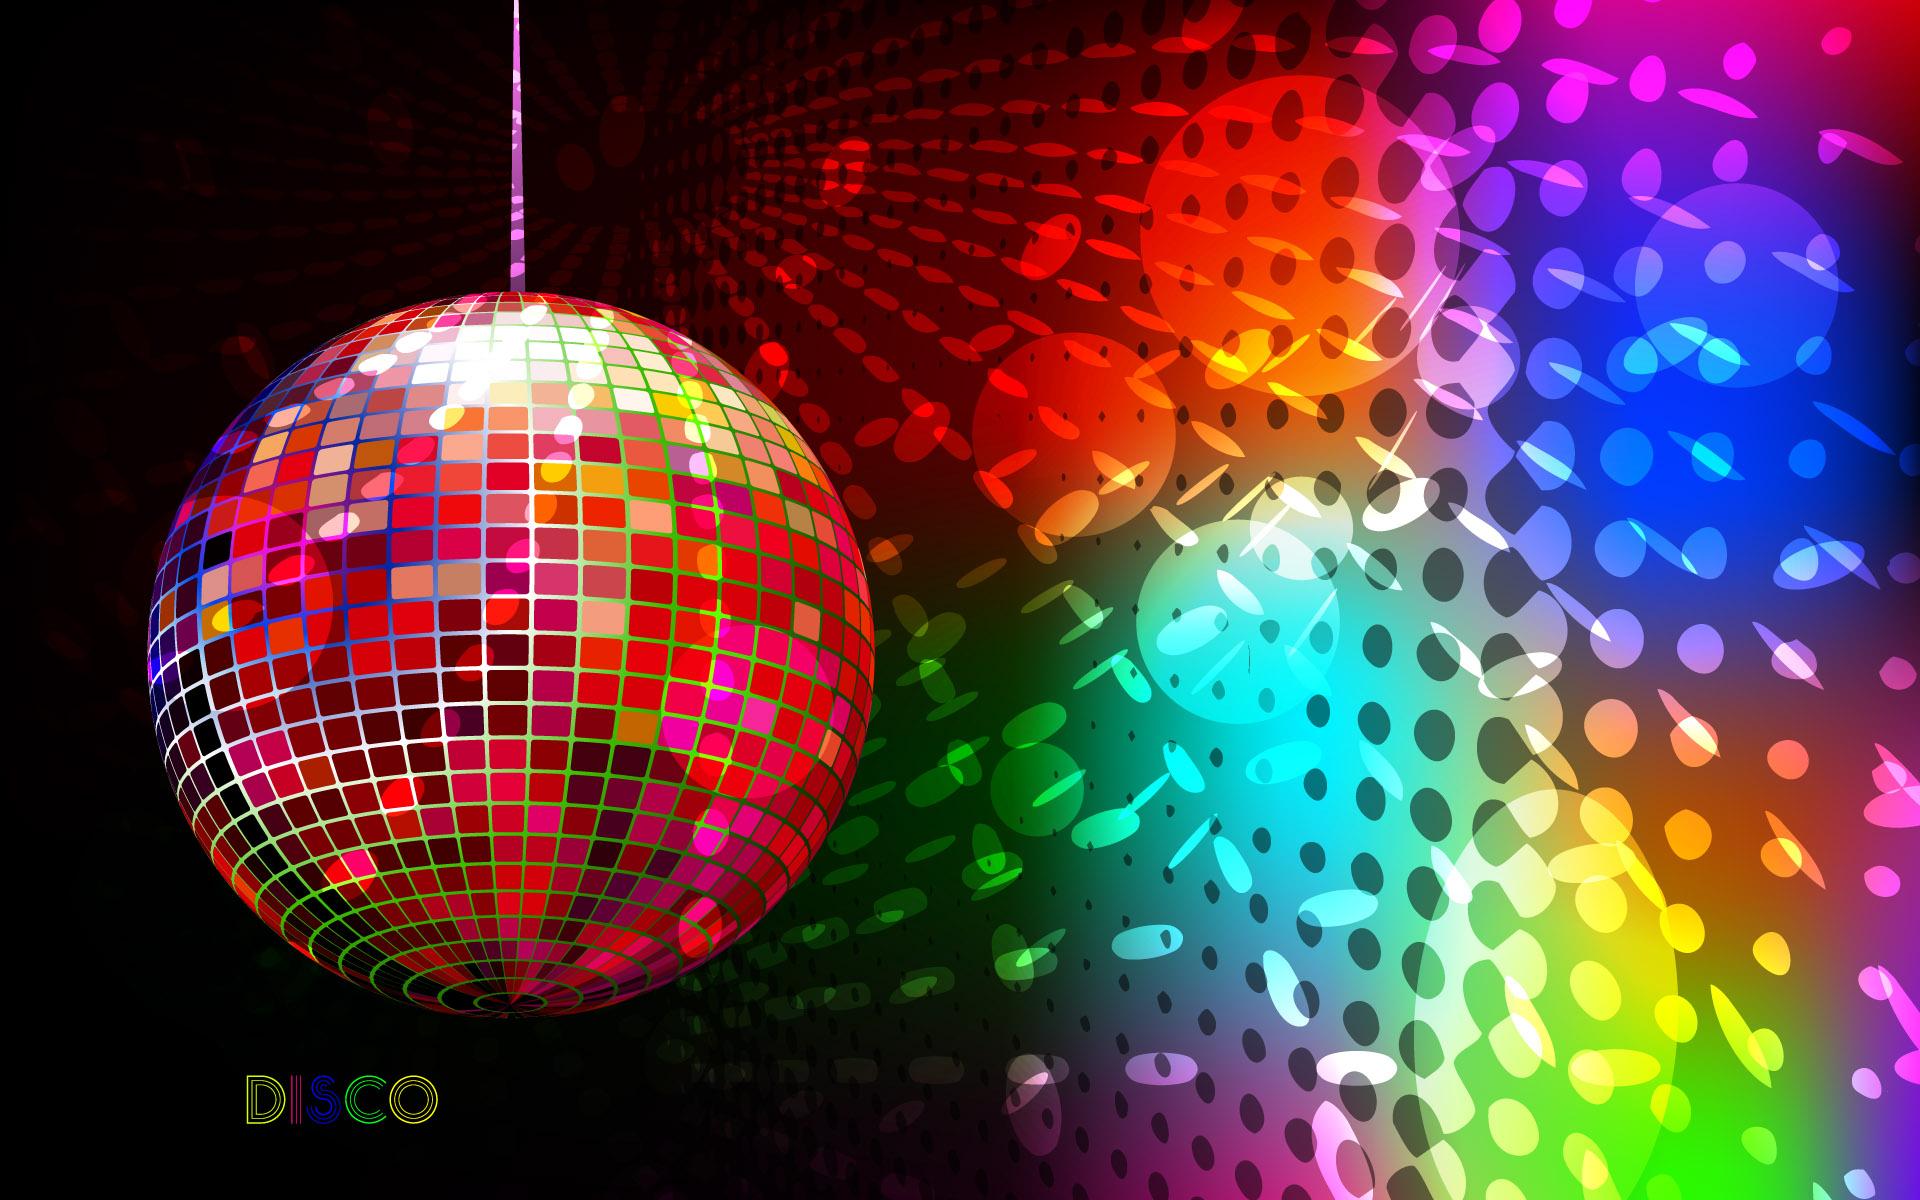 3d disco wallpaper - photo #2